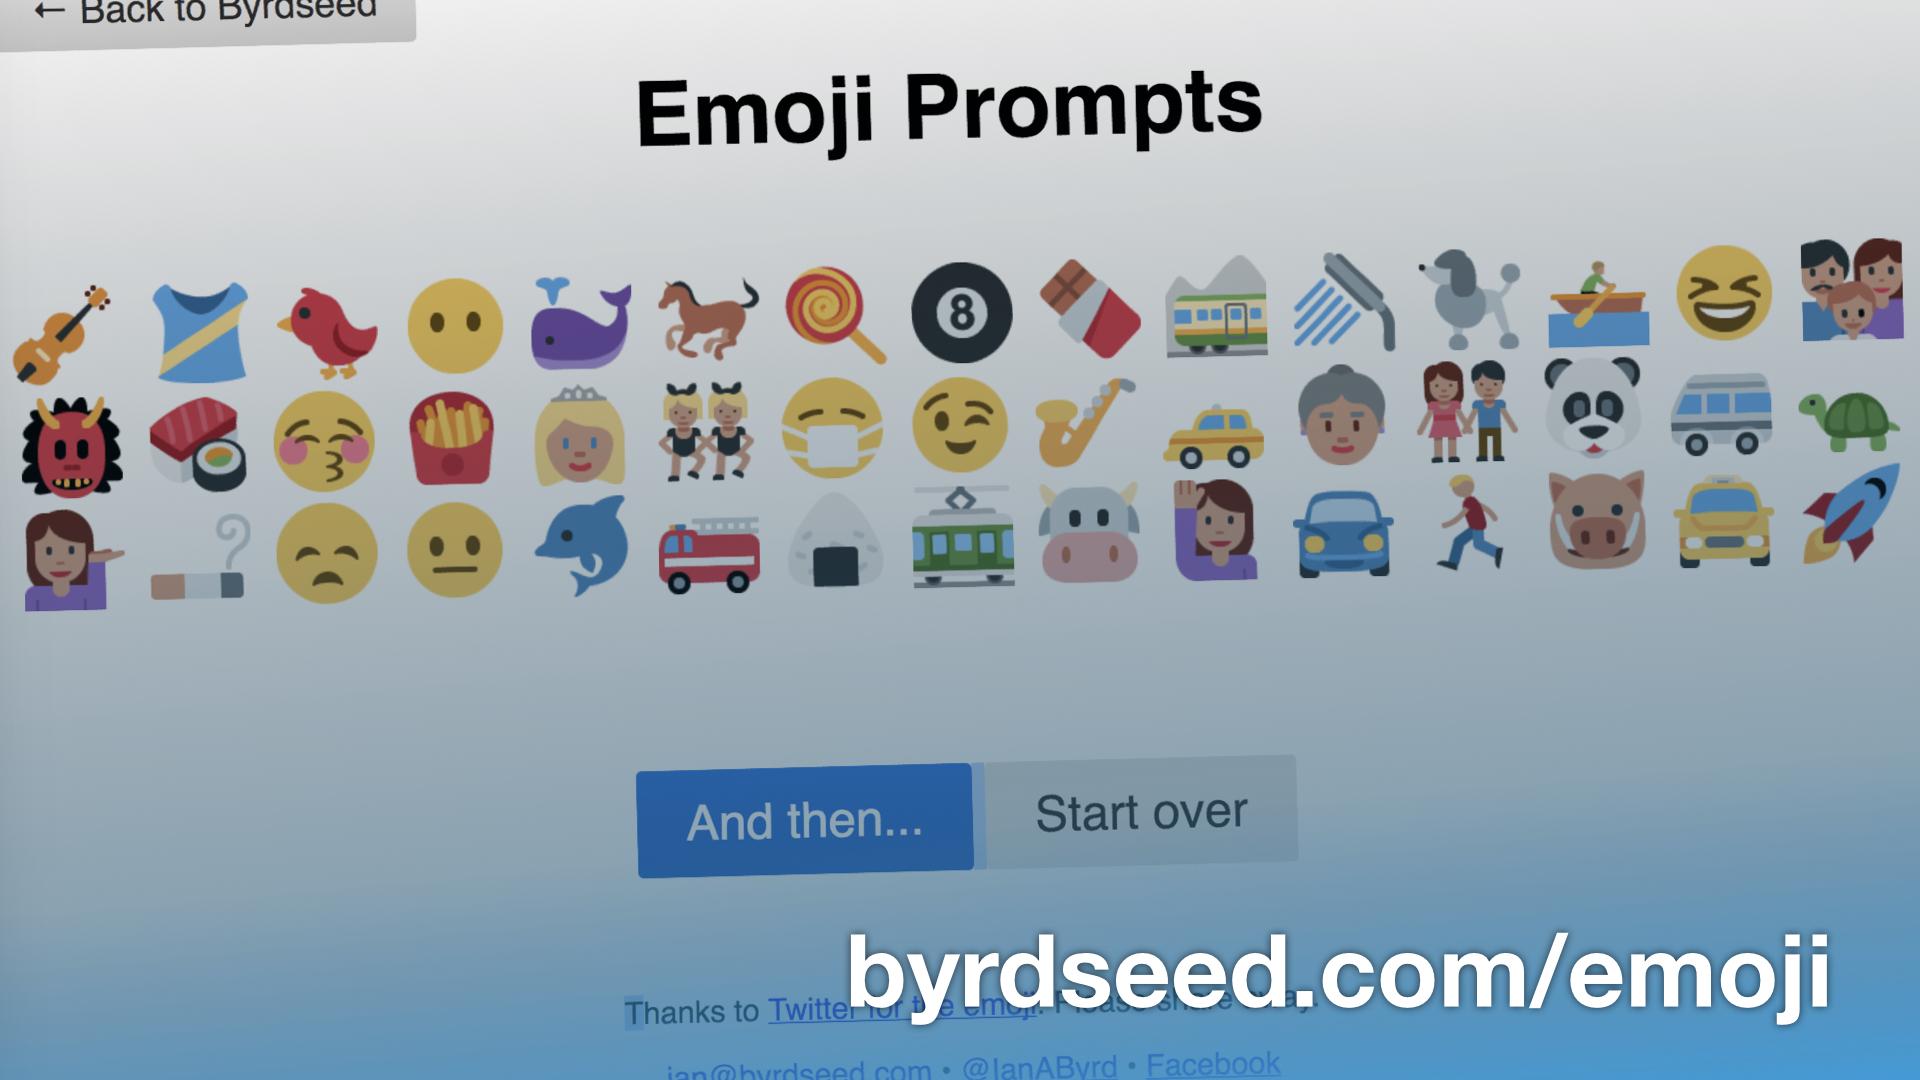 Emoji Prompts